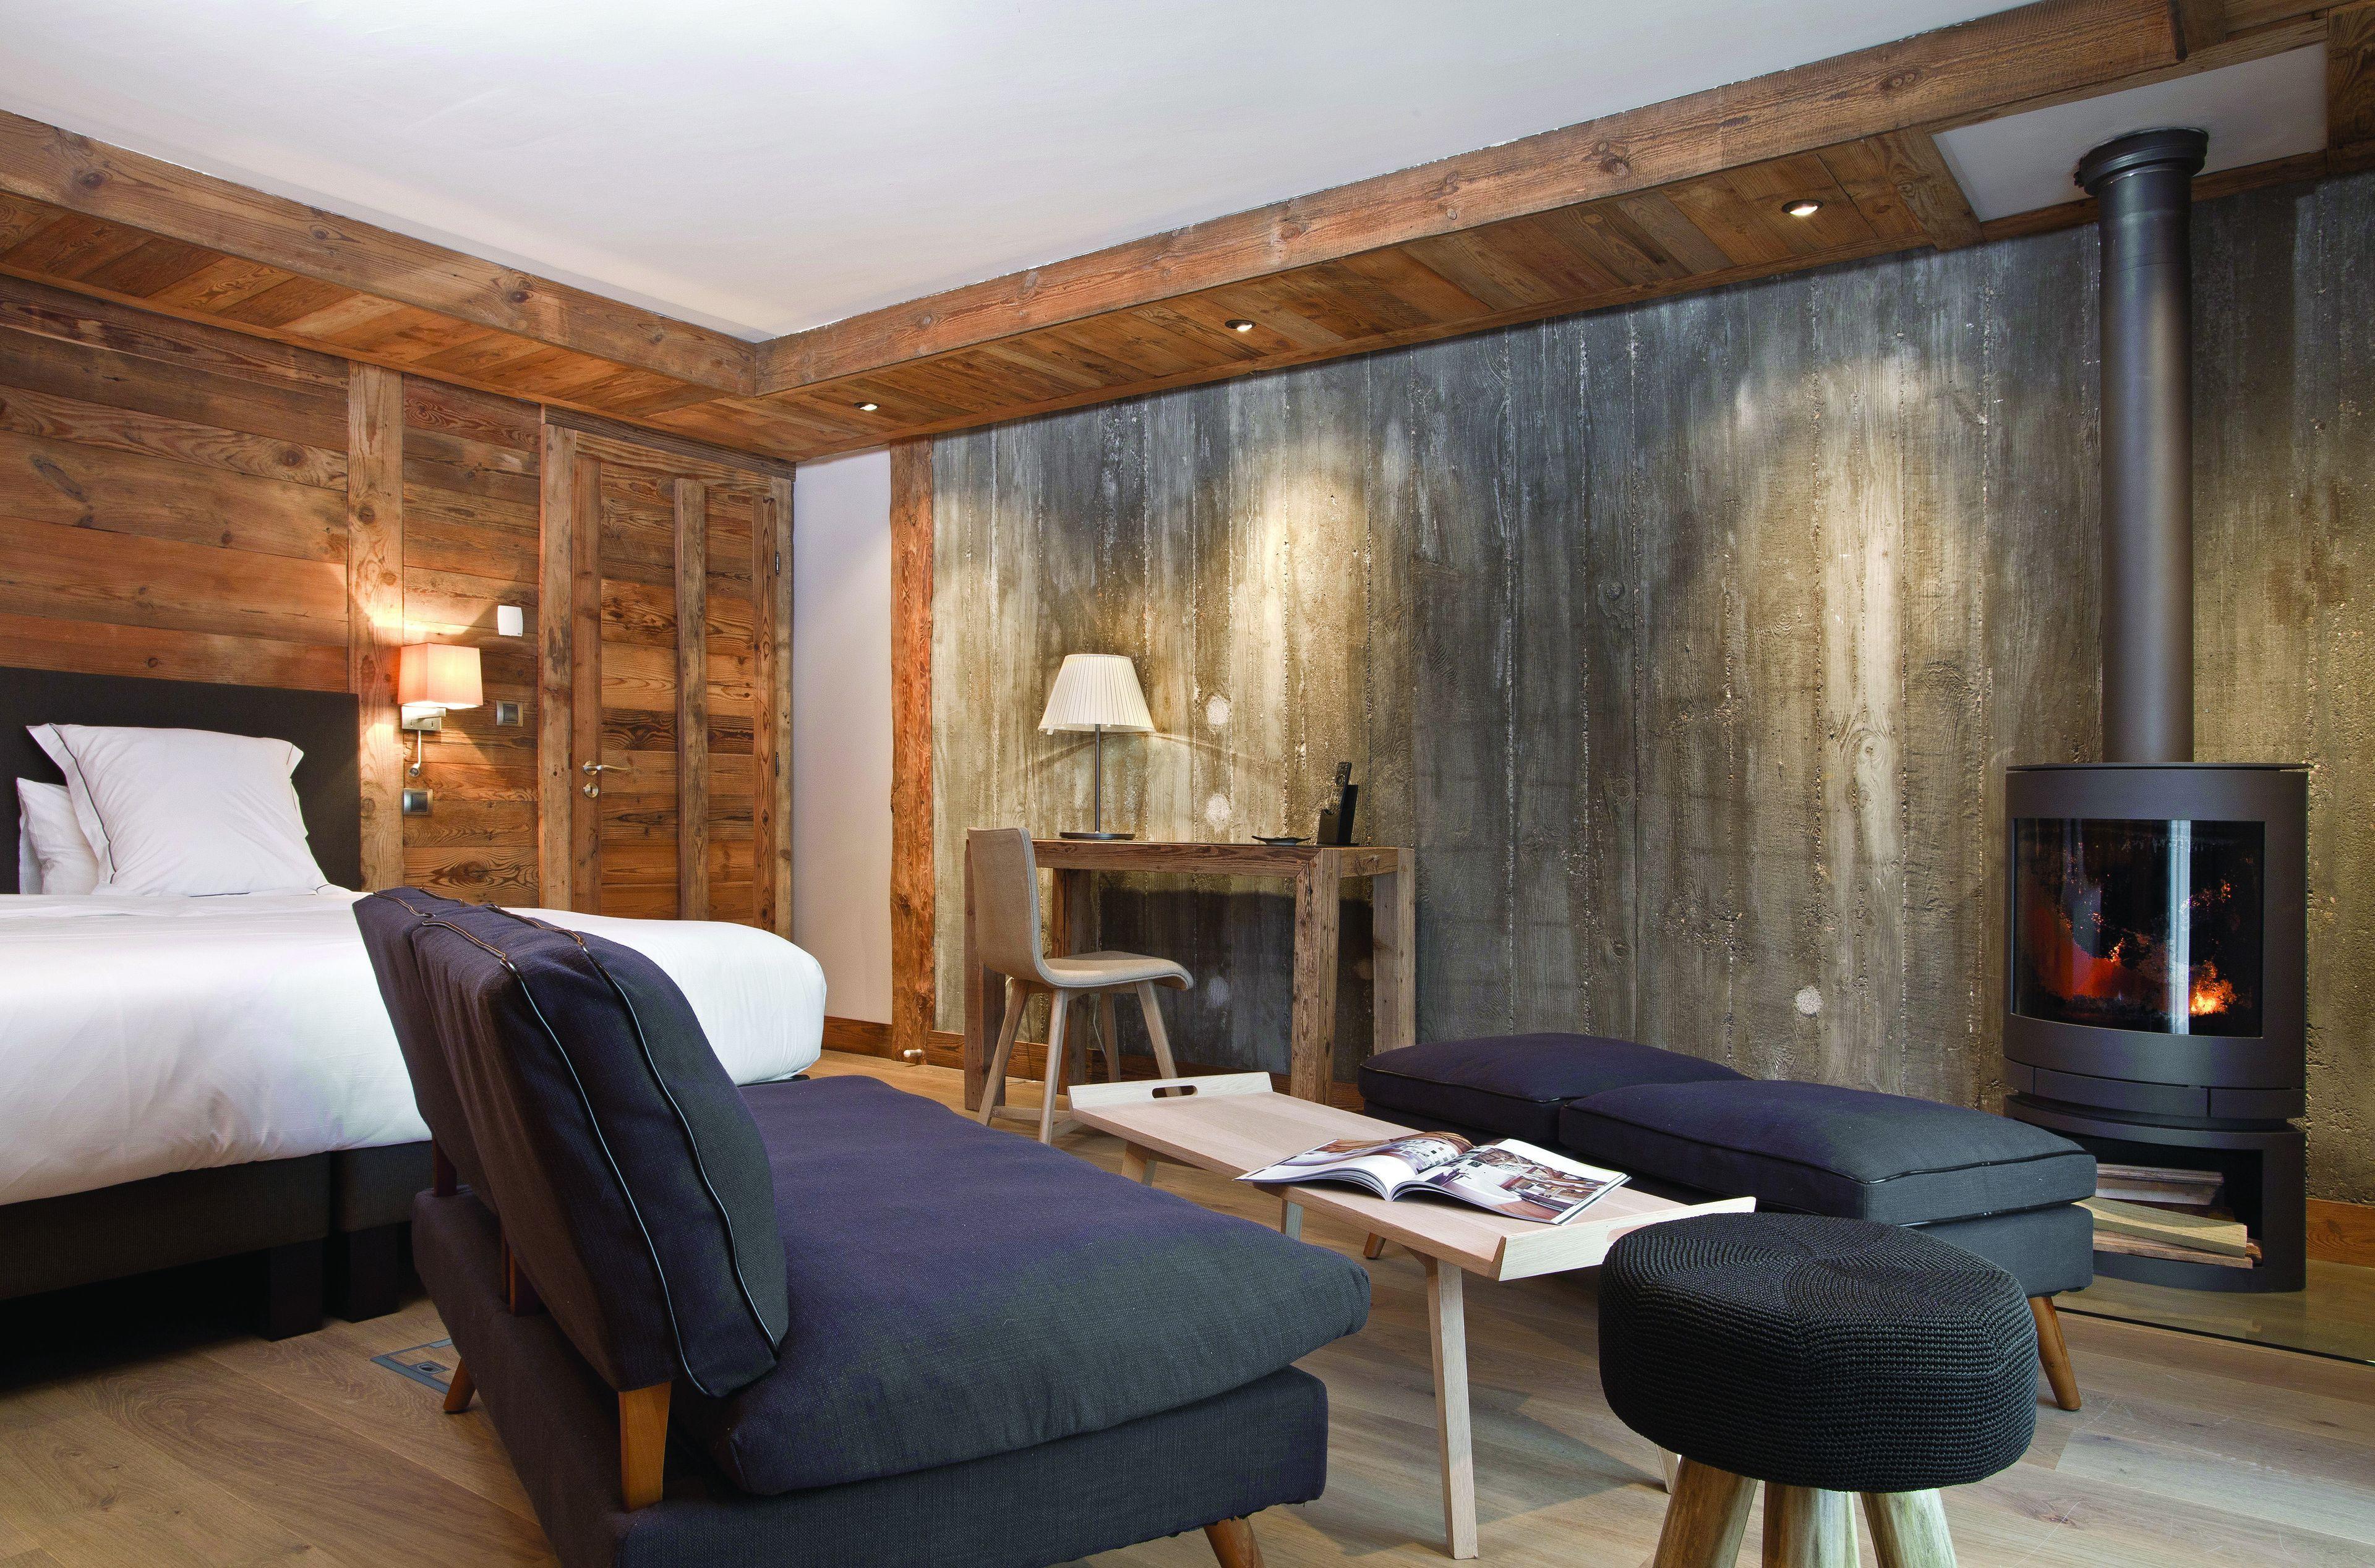 Courtesy of Chalet-Hôtel La Marmotte / Expedia.com